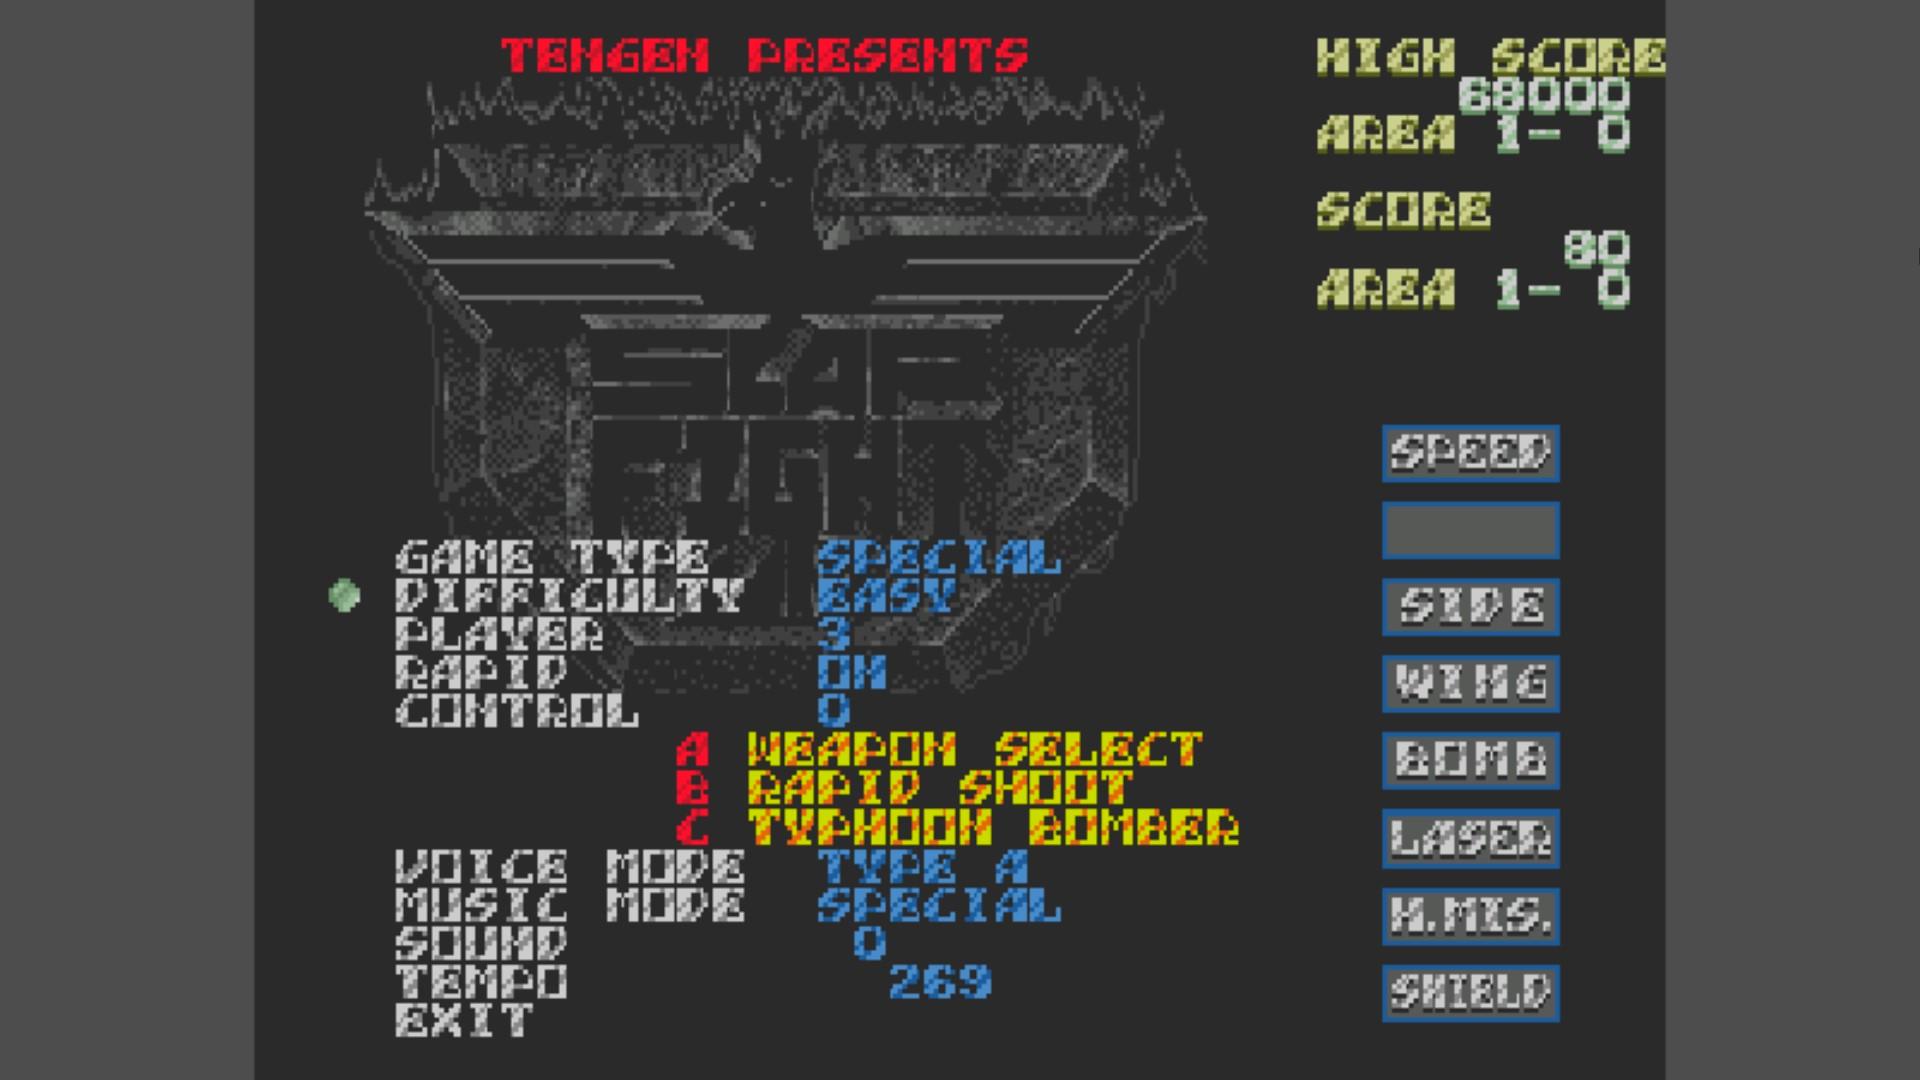 AkinNahtanoj: Slap Fight [Type Special] [Easy] (Sega Genesis / MegaDrive Emulated) 41,320 points on 2020-10-26 14:57:36